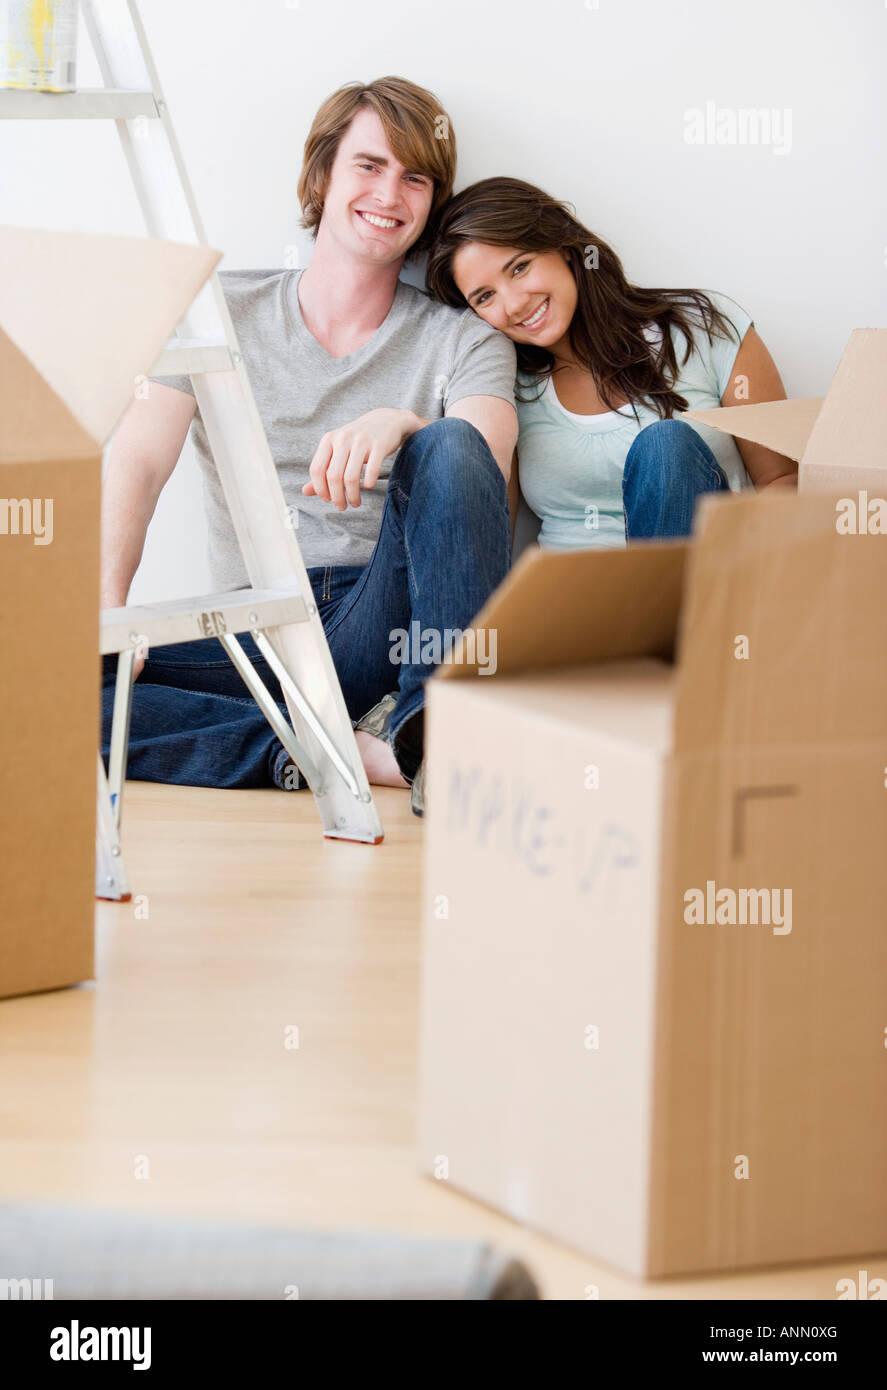 Paar sitzt neben Umzugskartons Stockbild